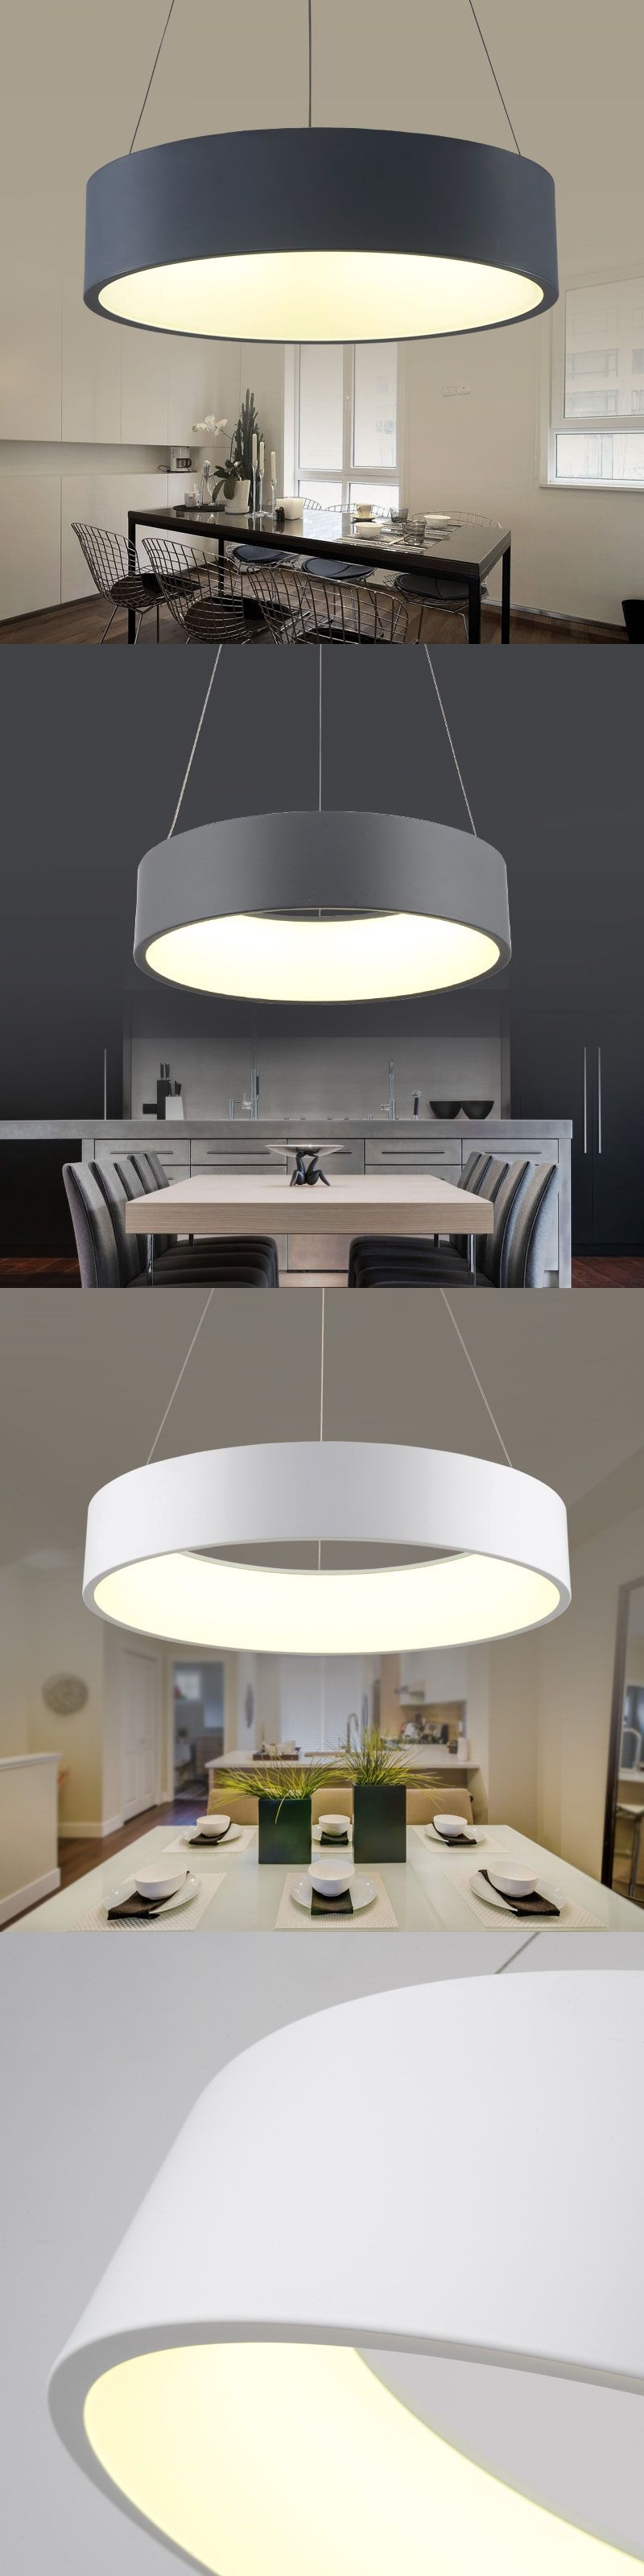 110v 220v Led Pendant Light Pendentes Para Sala De Jantar Hanglampen  -> Lustre Sala De Jantar Led